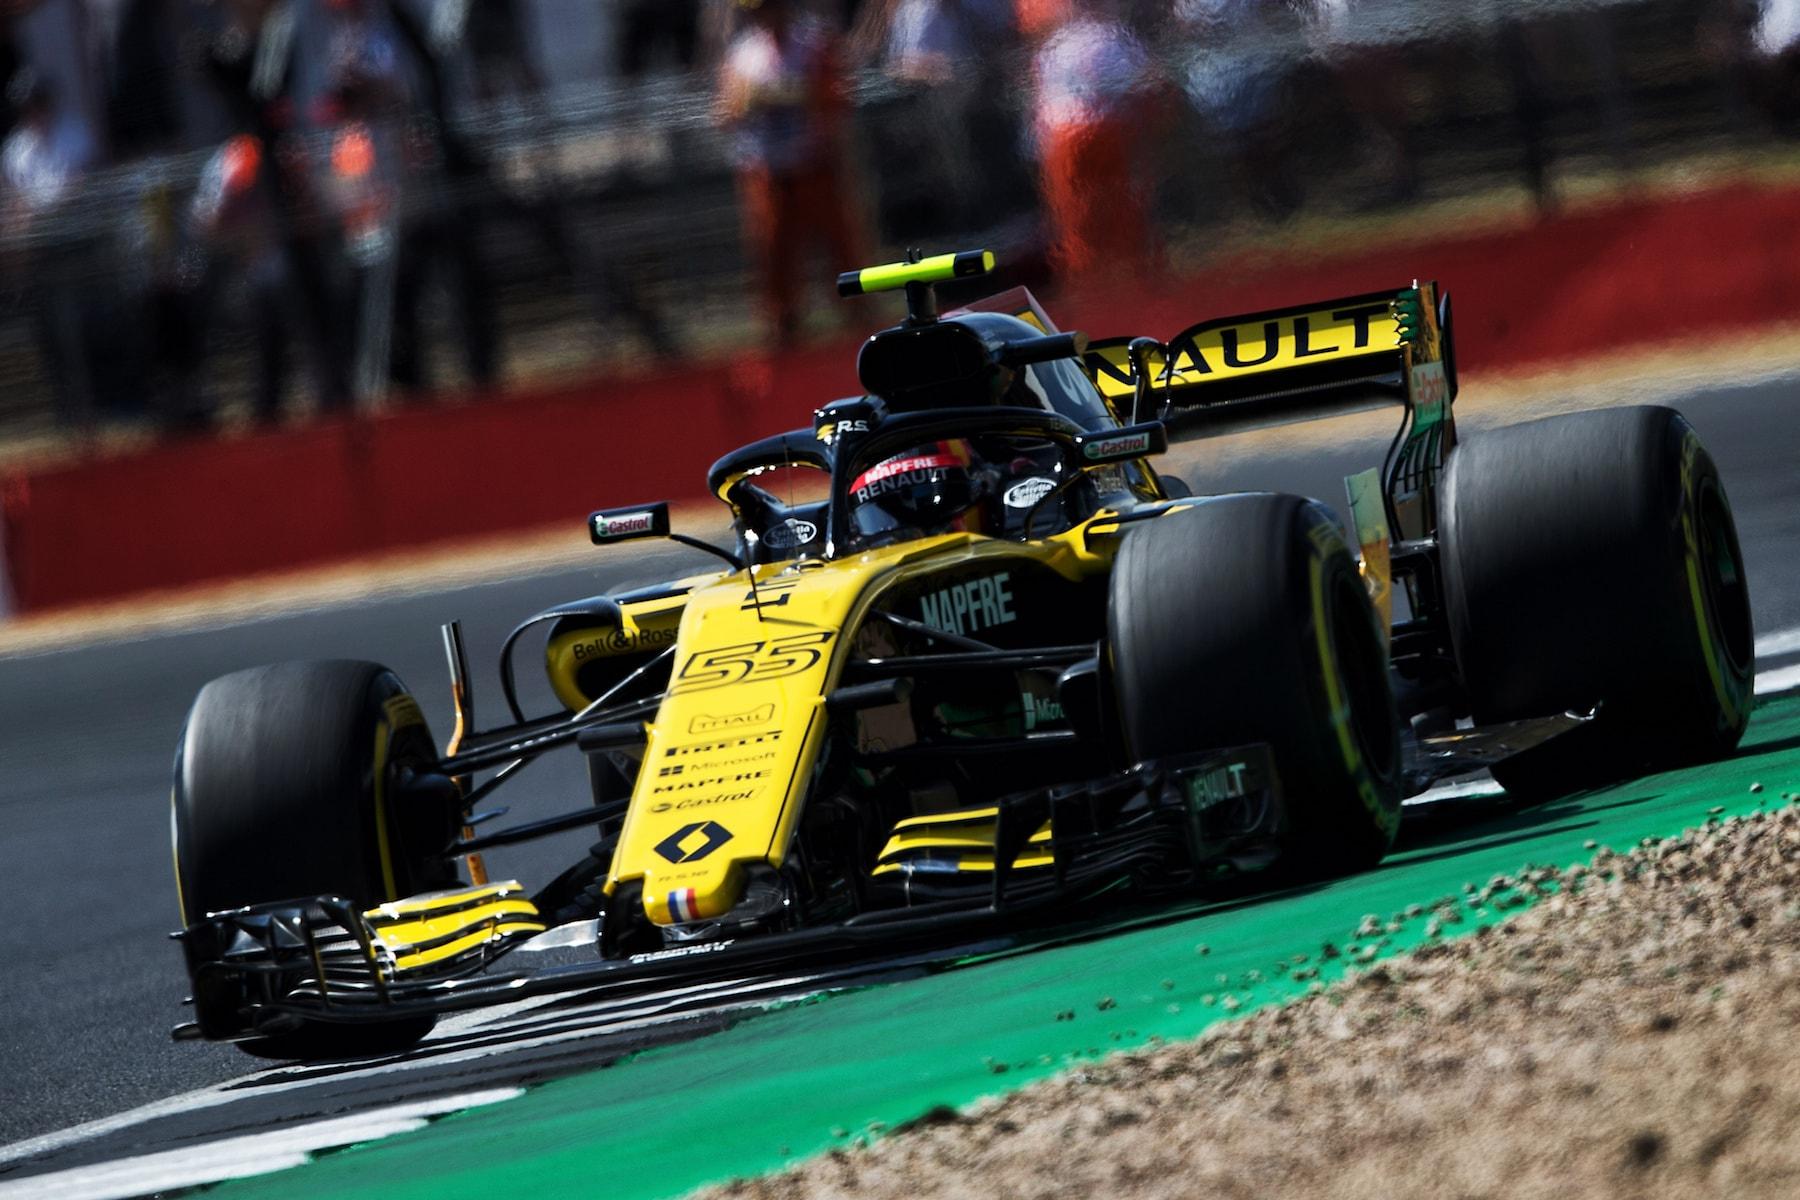 2018 Carlos Sainz | Renault RS18 | 2018 British GP FP3 2 copy.jpg